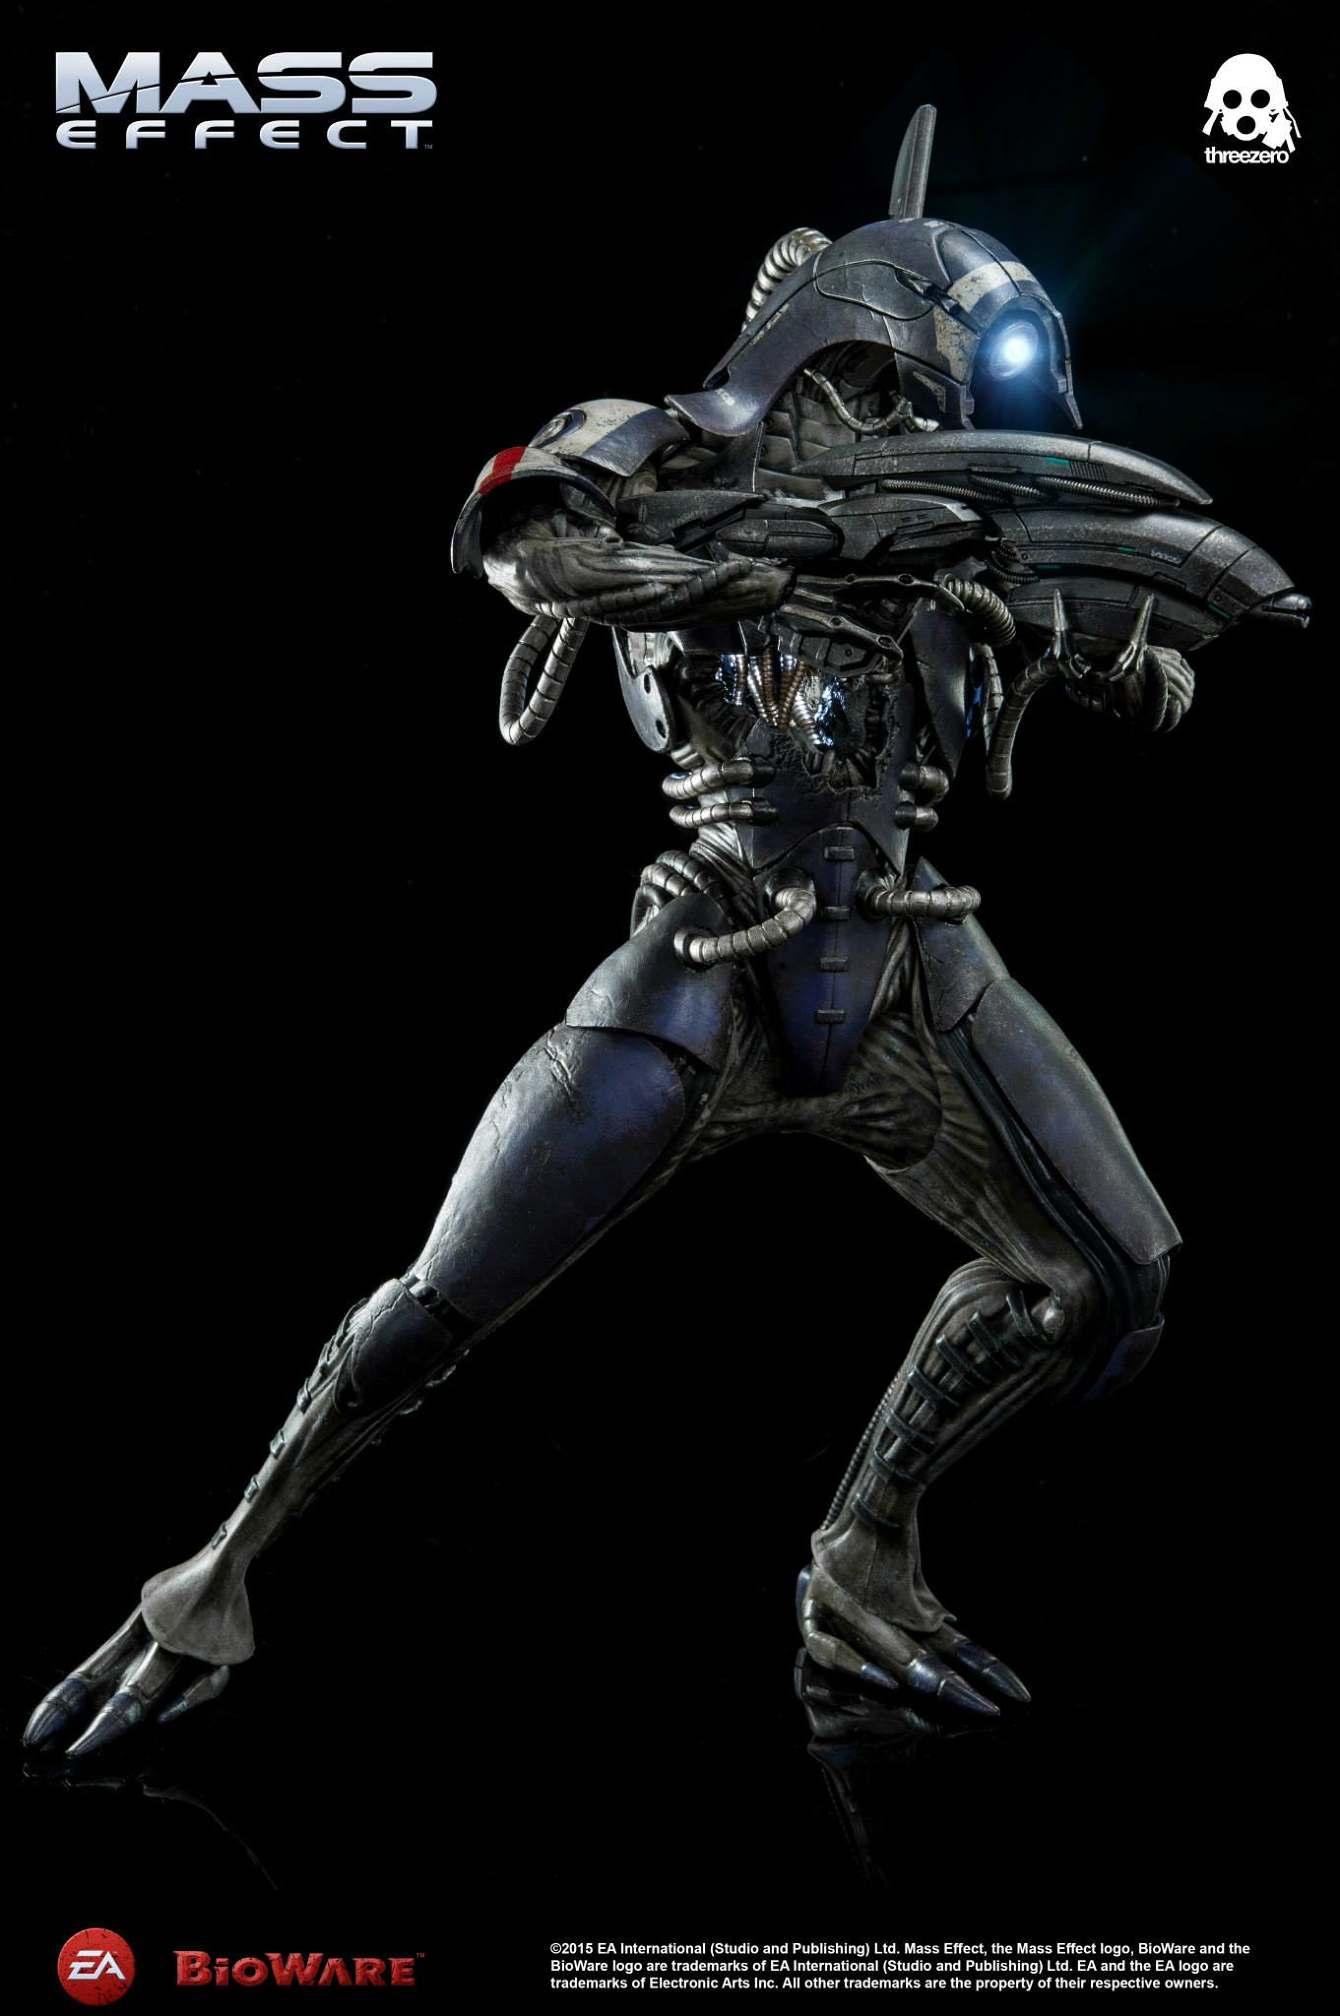 ThreeZero-Bioware-video-game-Legion-Mass-Effect-figure-5_1340_c.jpg